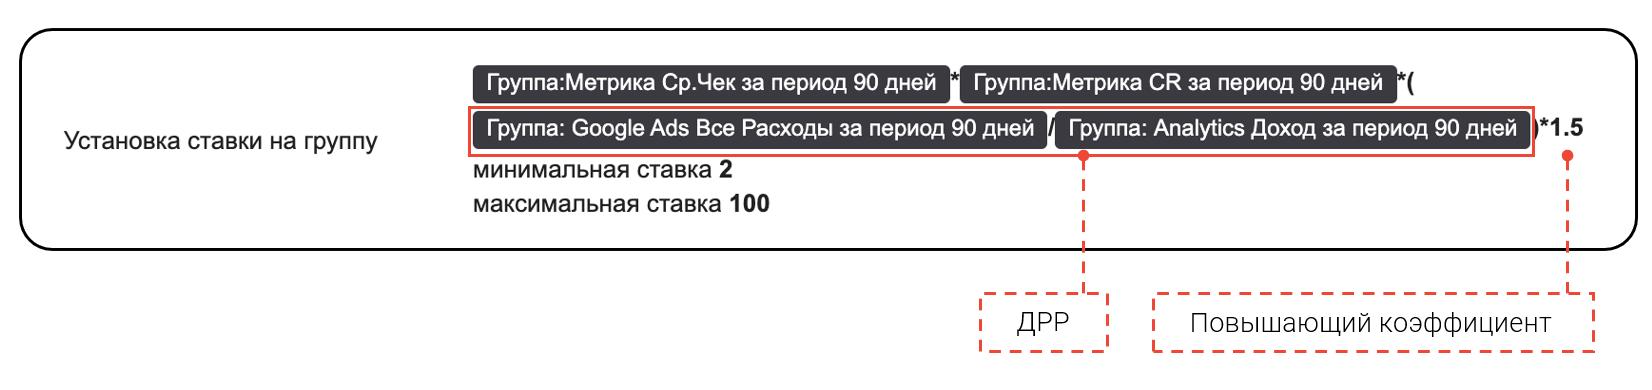 Оптимизация ДРР